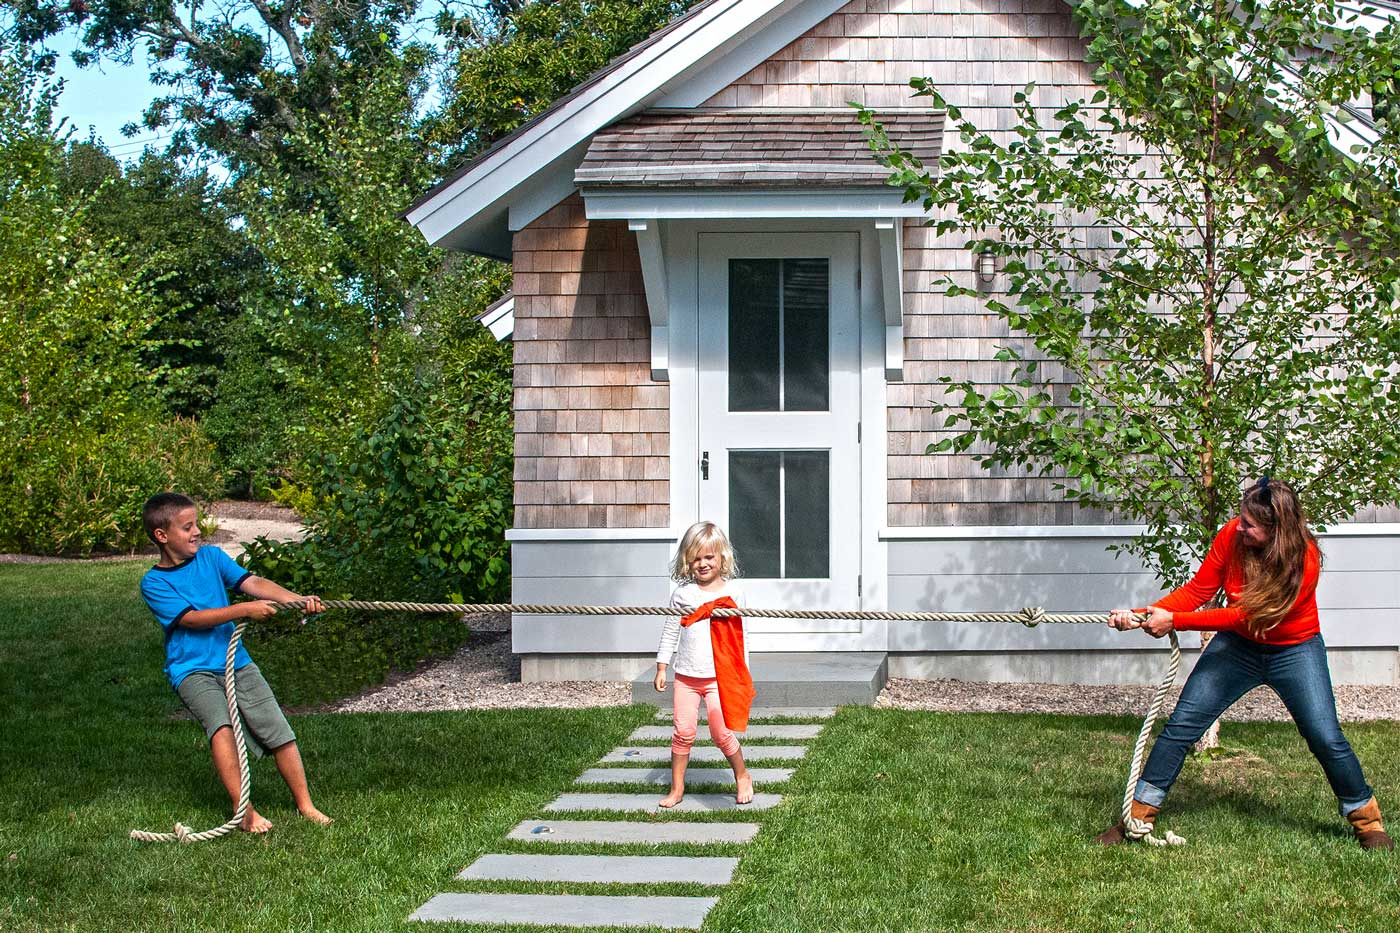 woman playing tug a war with kids